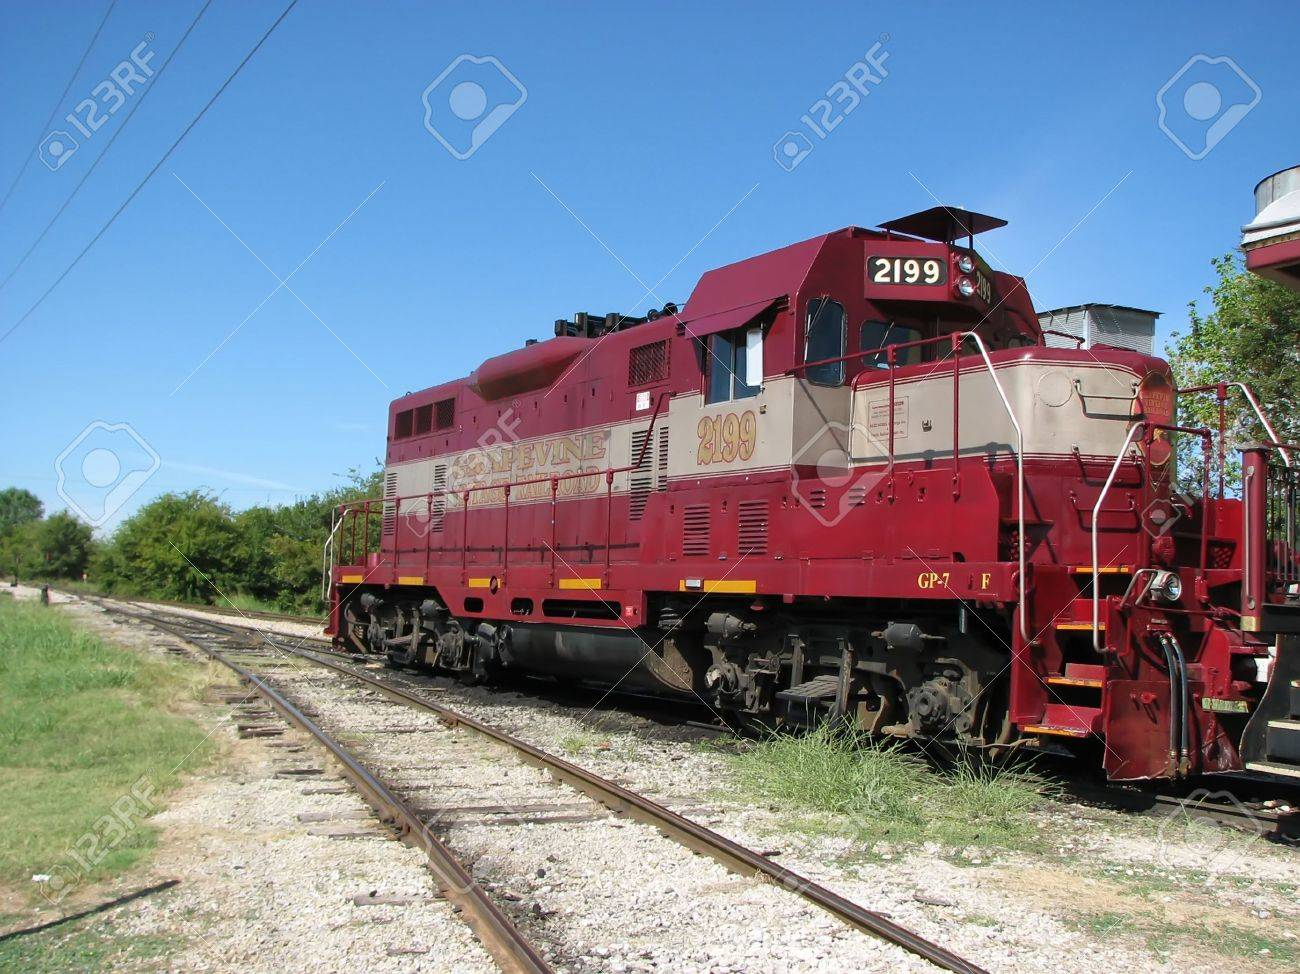 Vintage Rail Road Train Engine Stock Photo - 1862184